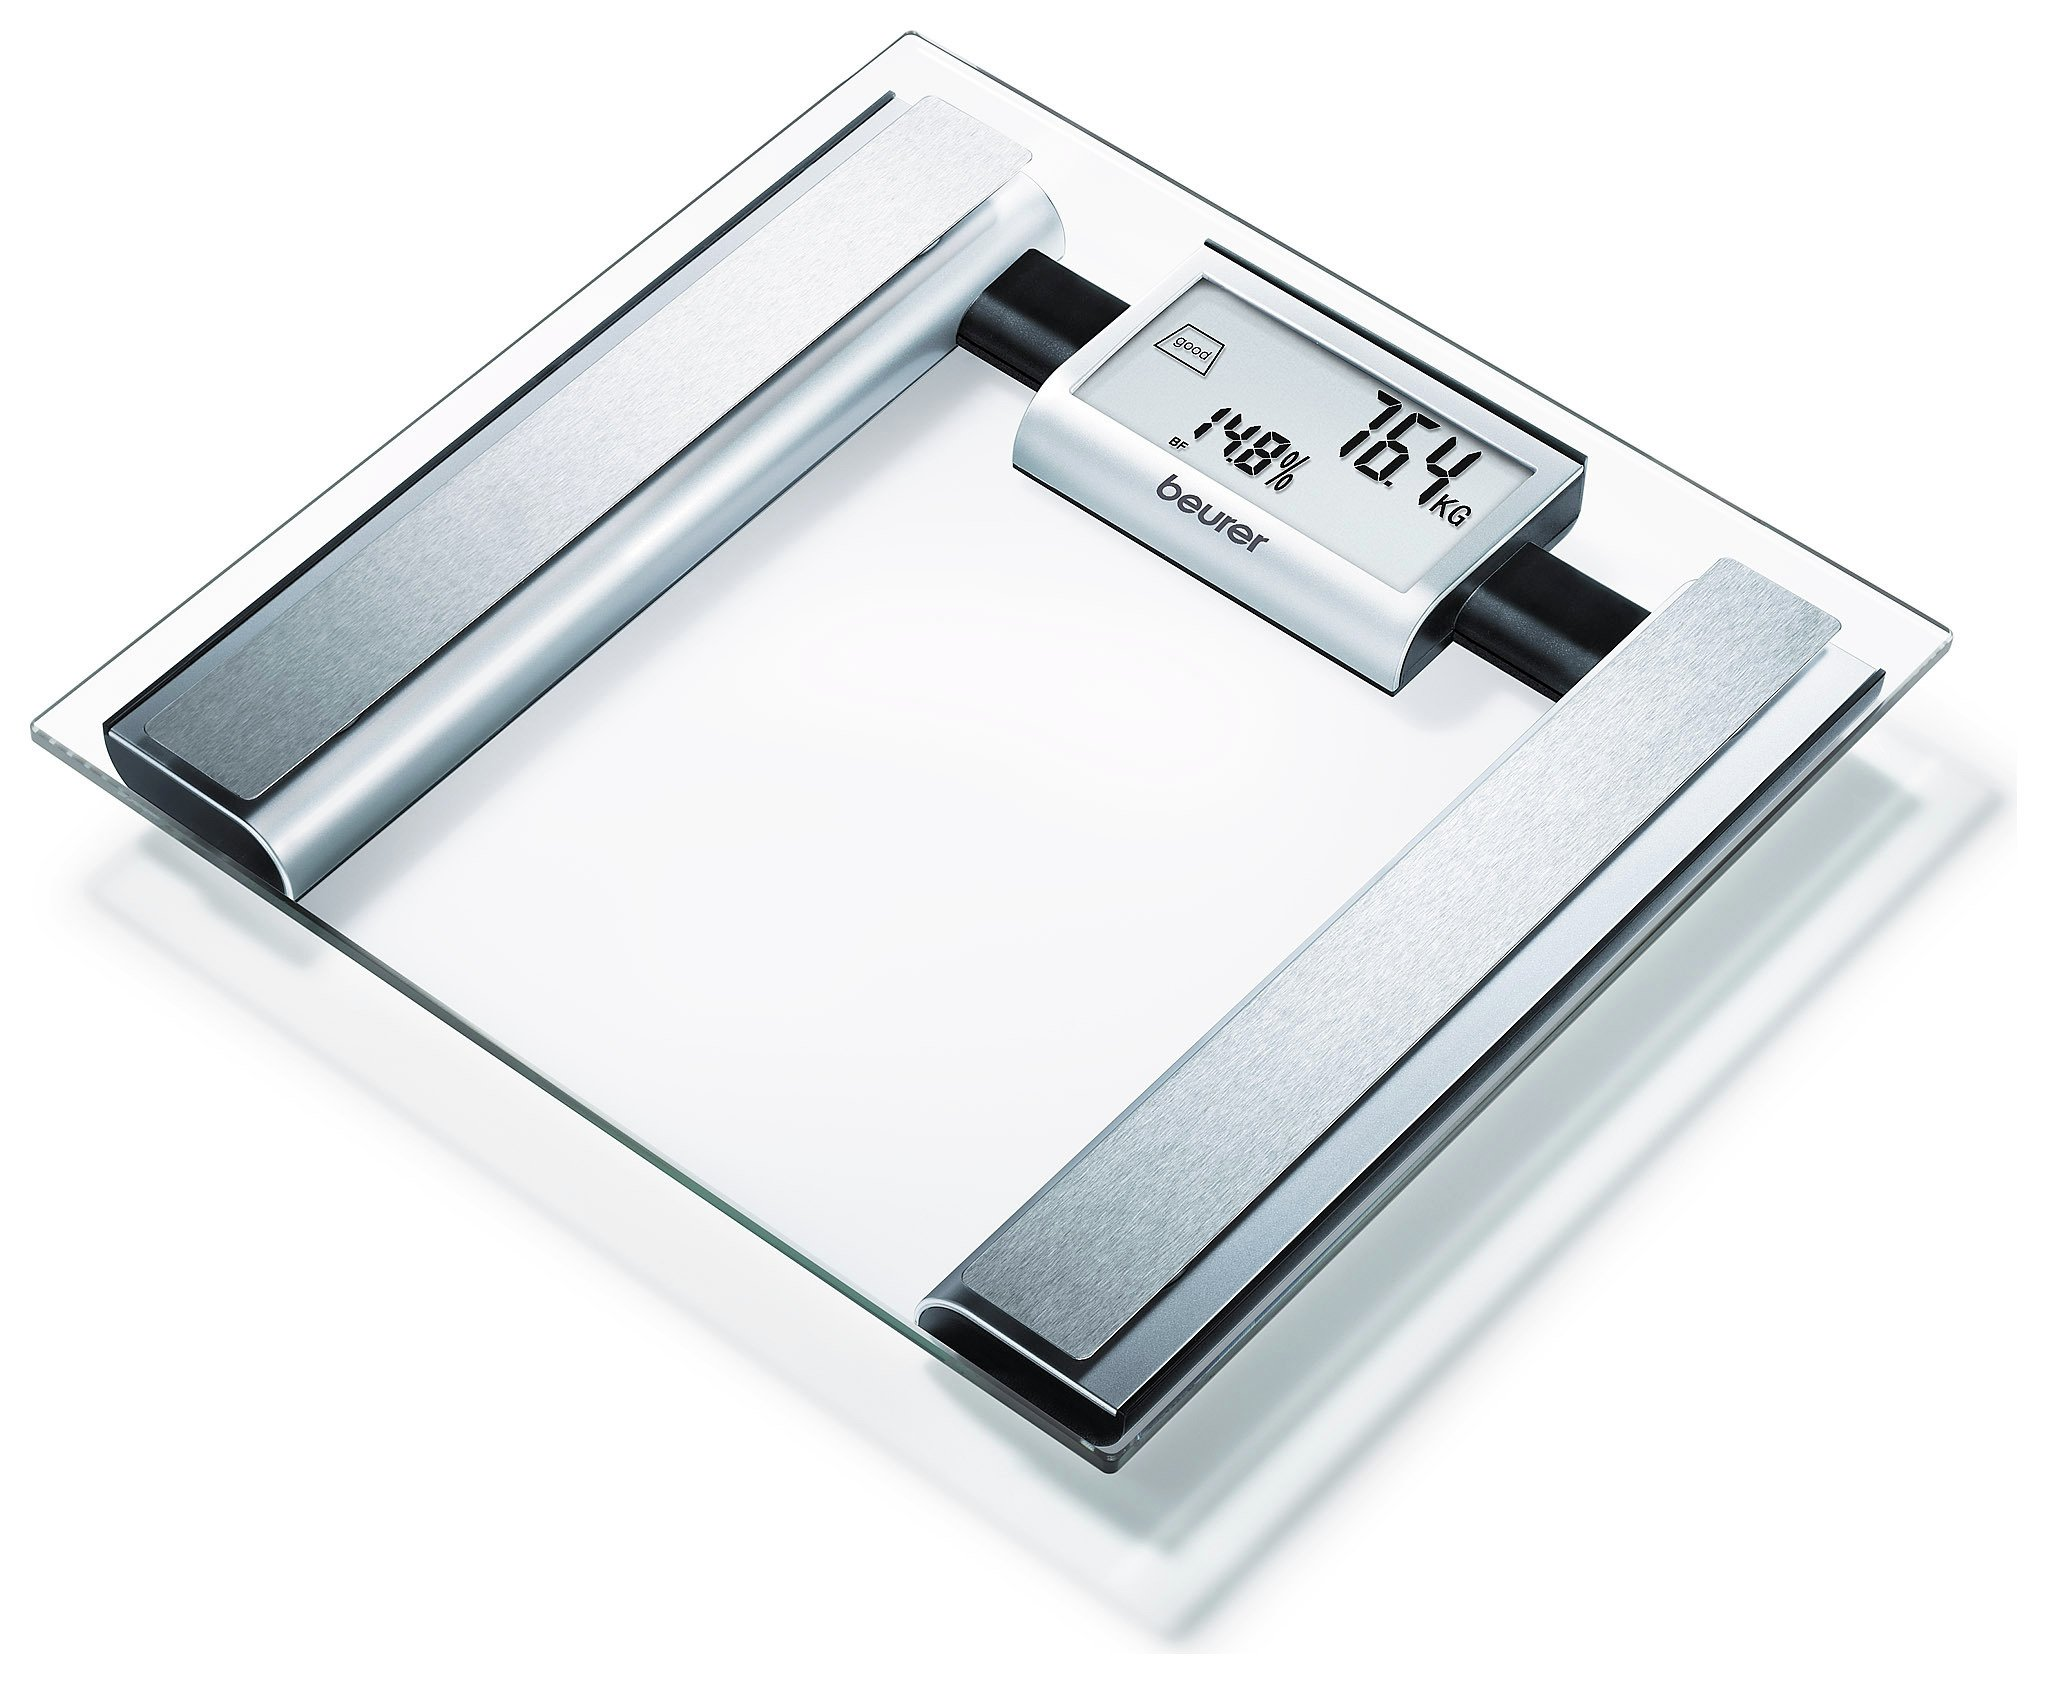 Image of Beurer BG39 Glass Diagnostic Bathroom Scale.